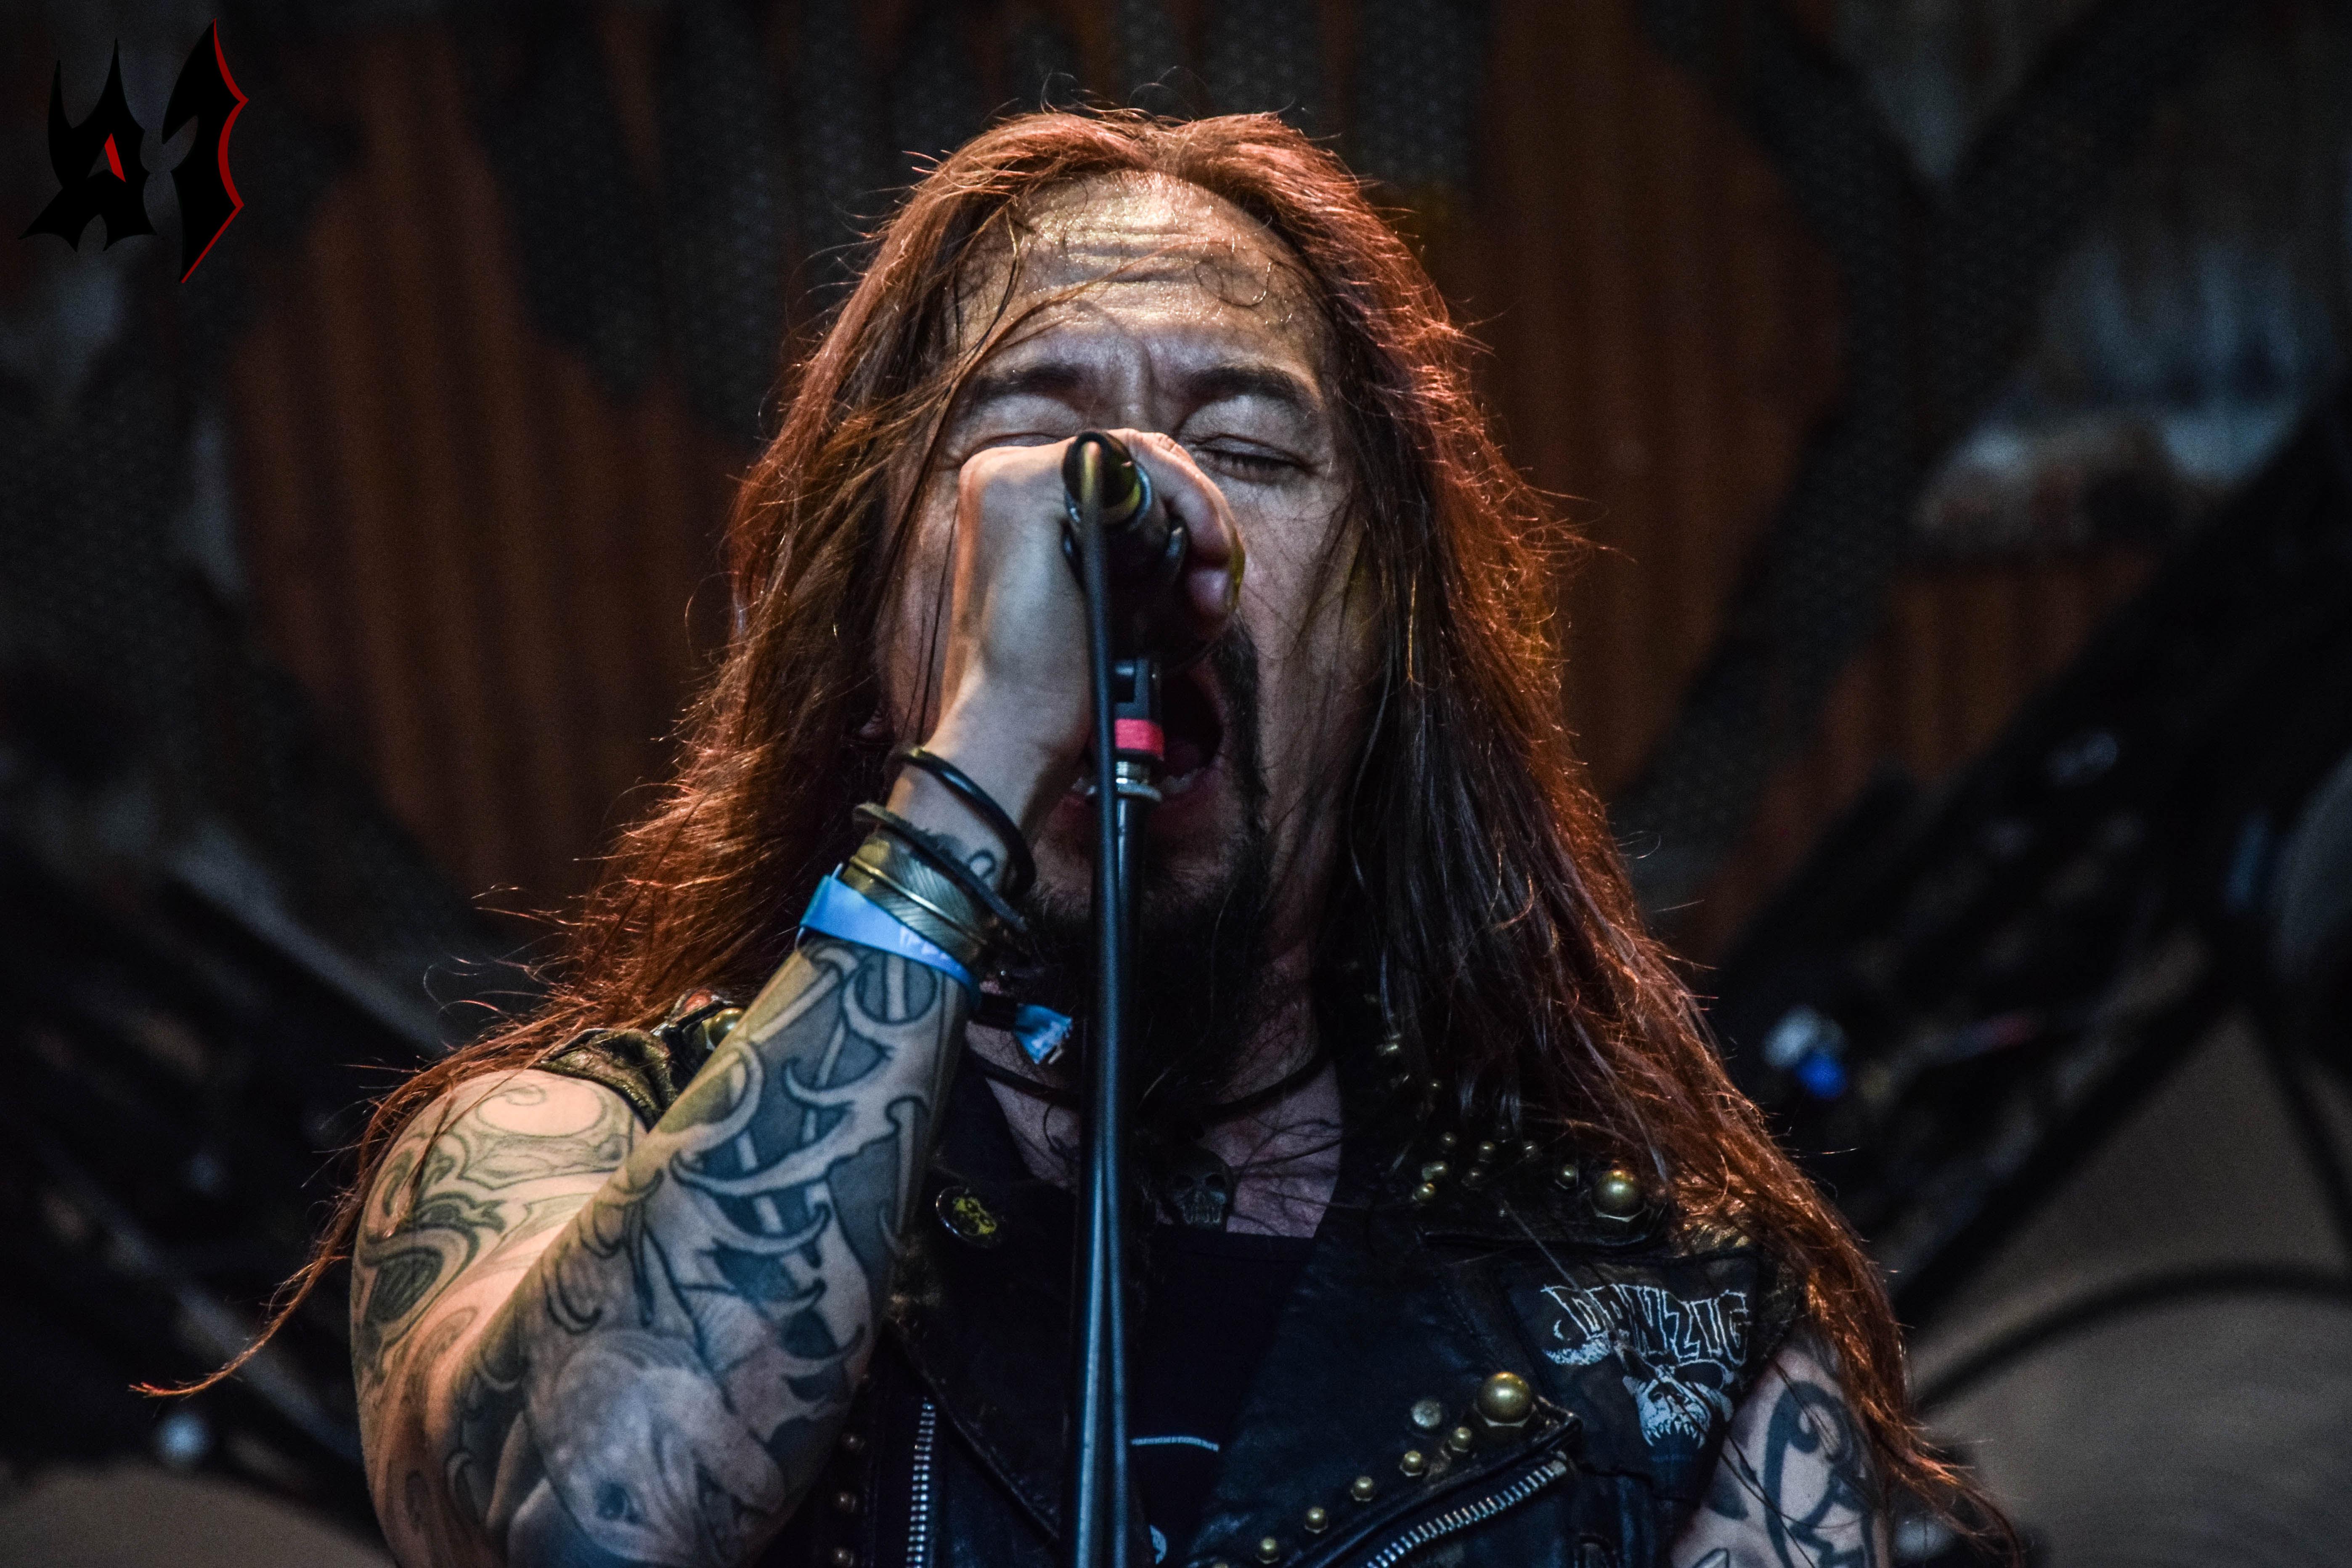 Hellfest 2018 – Day 3 - Amorphis 24